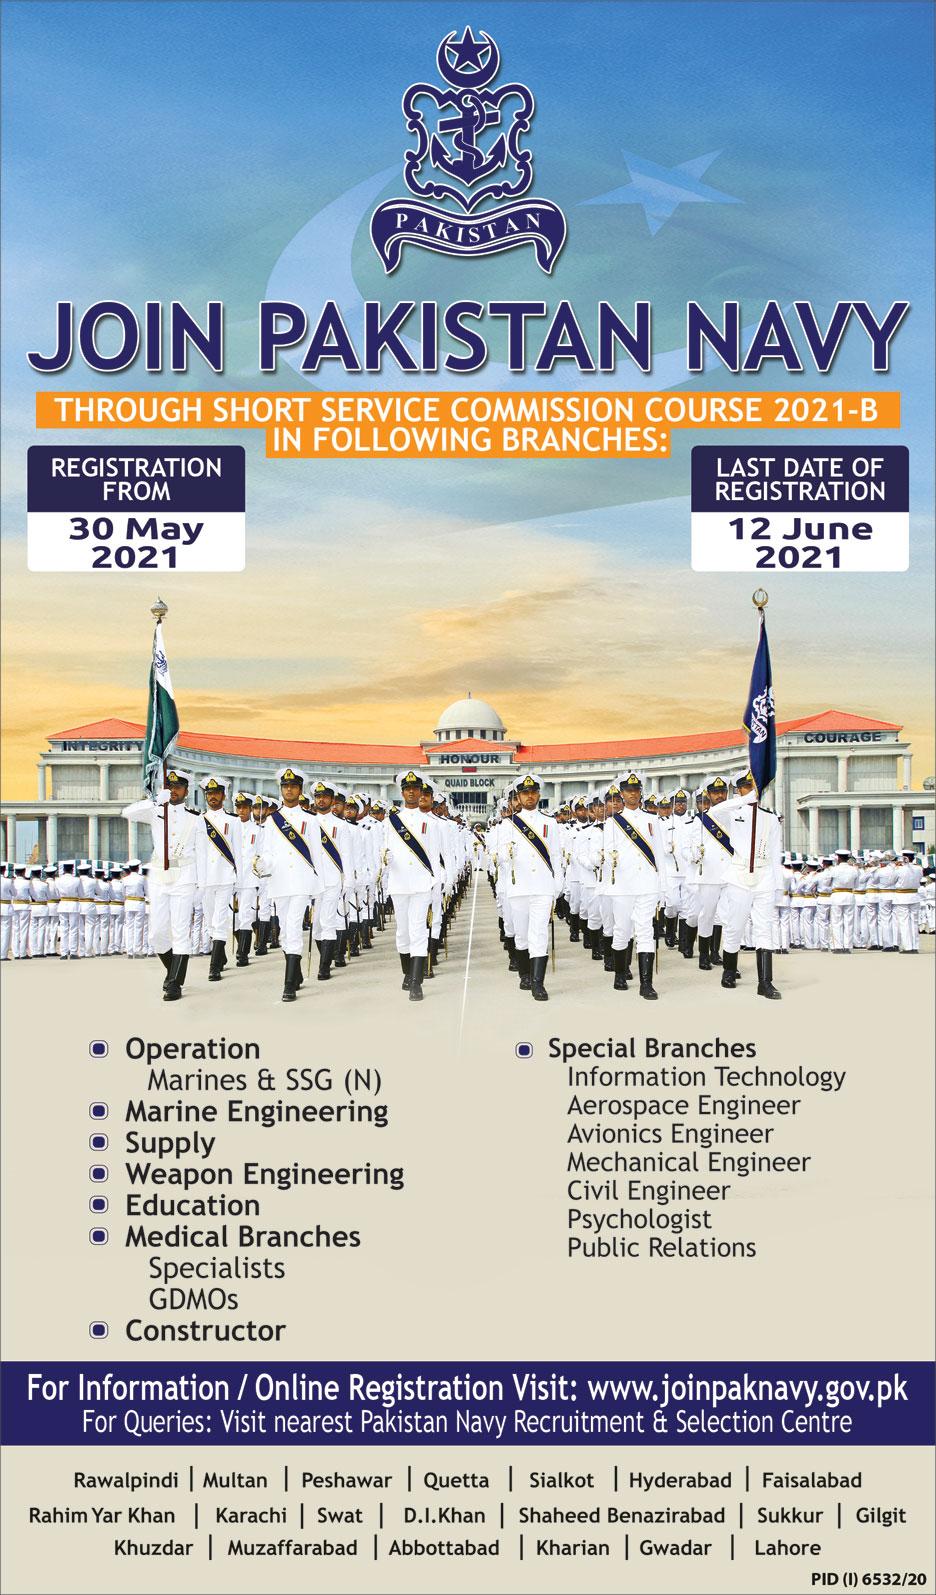 Pak navy latest ad